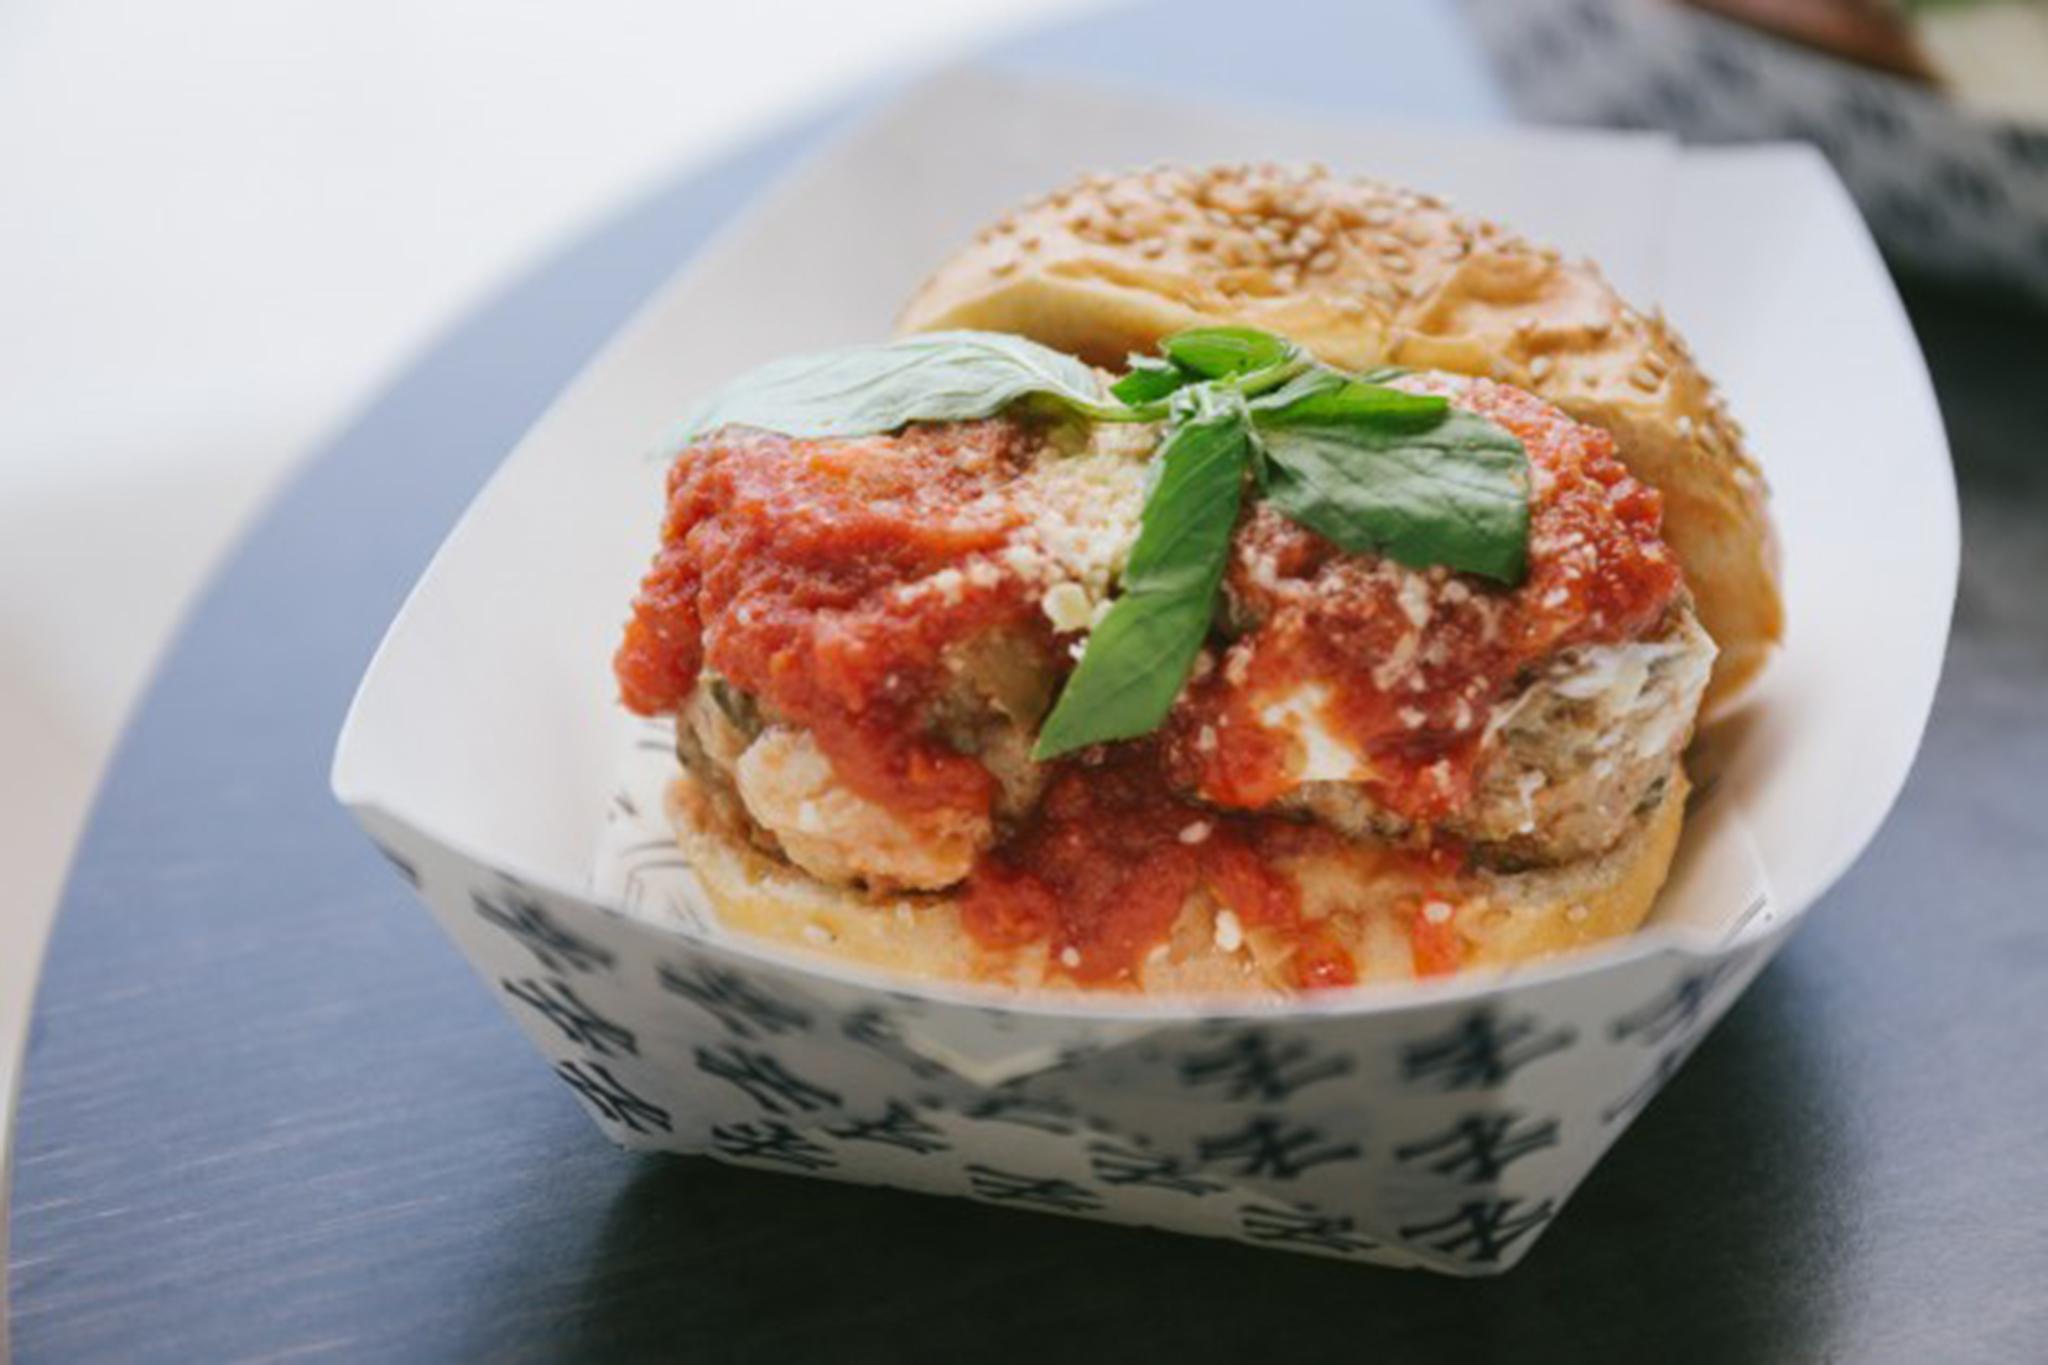 Metaball parmesan sandwich